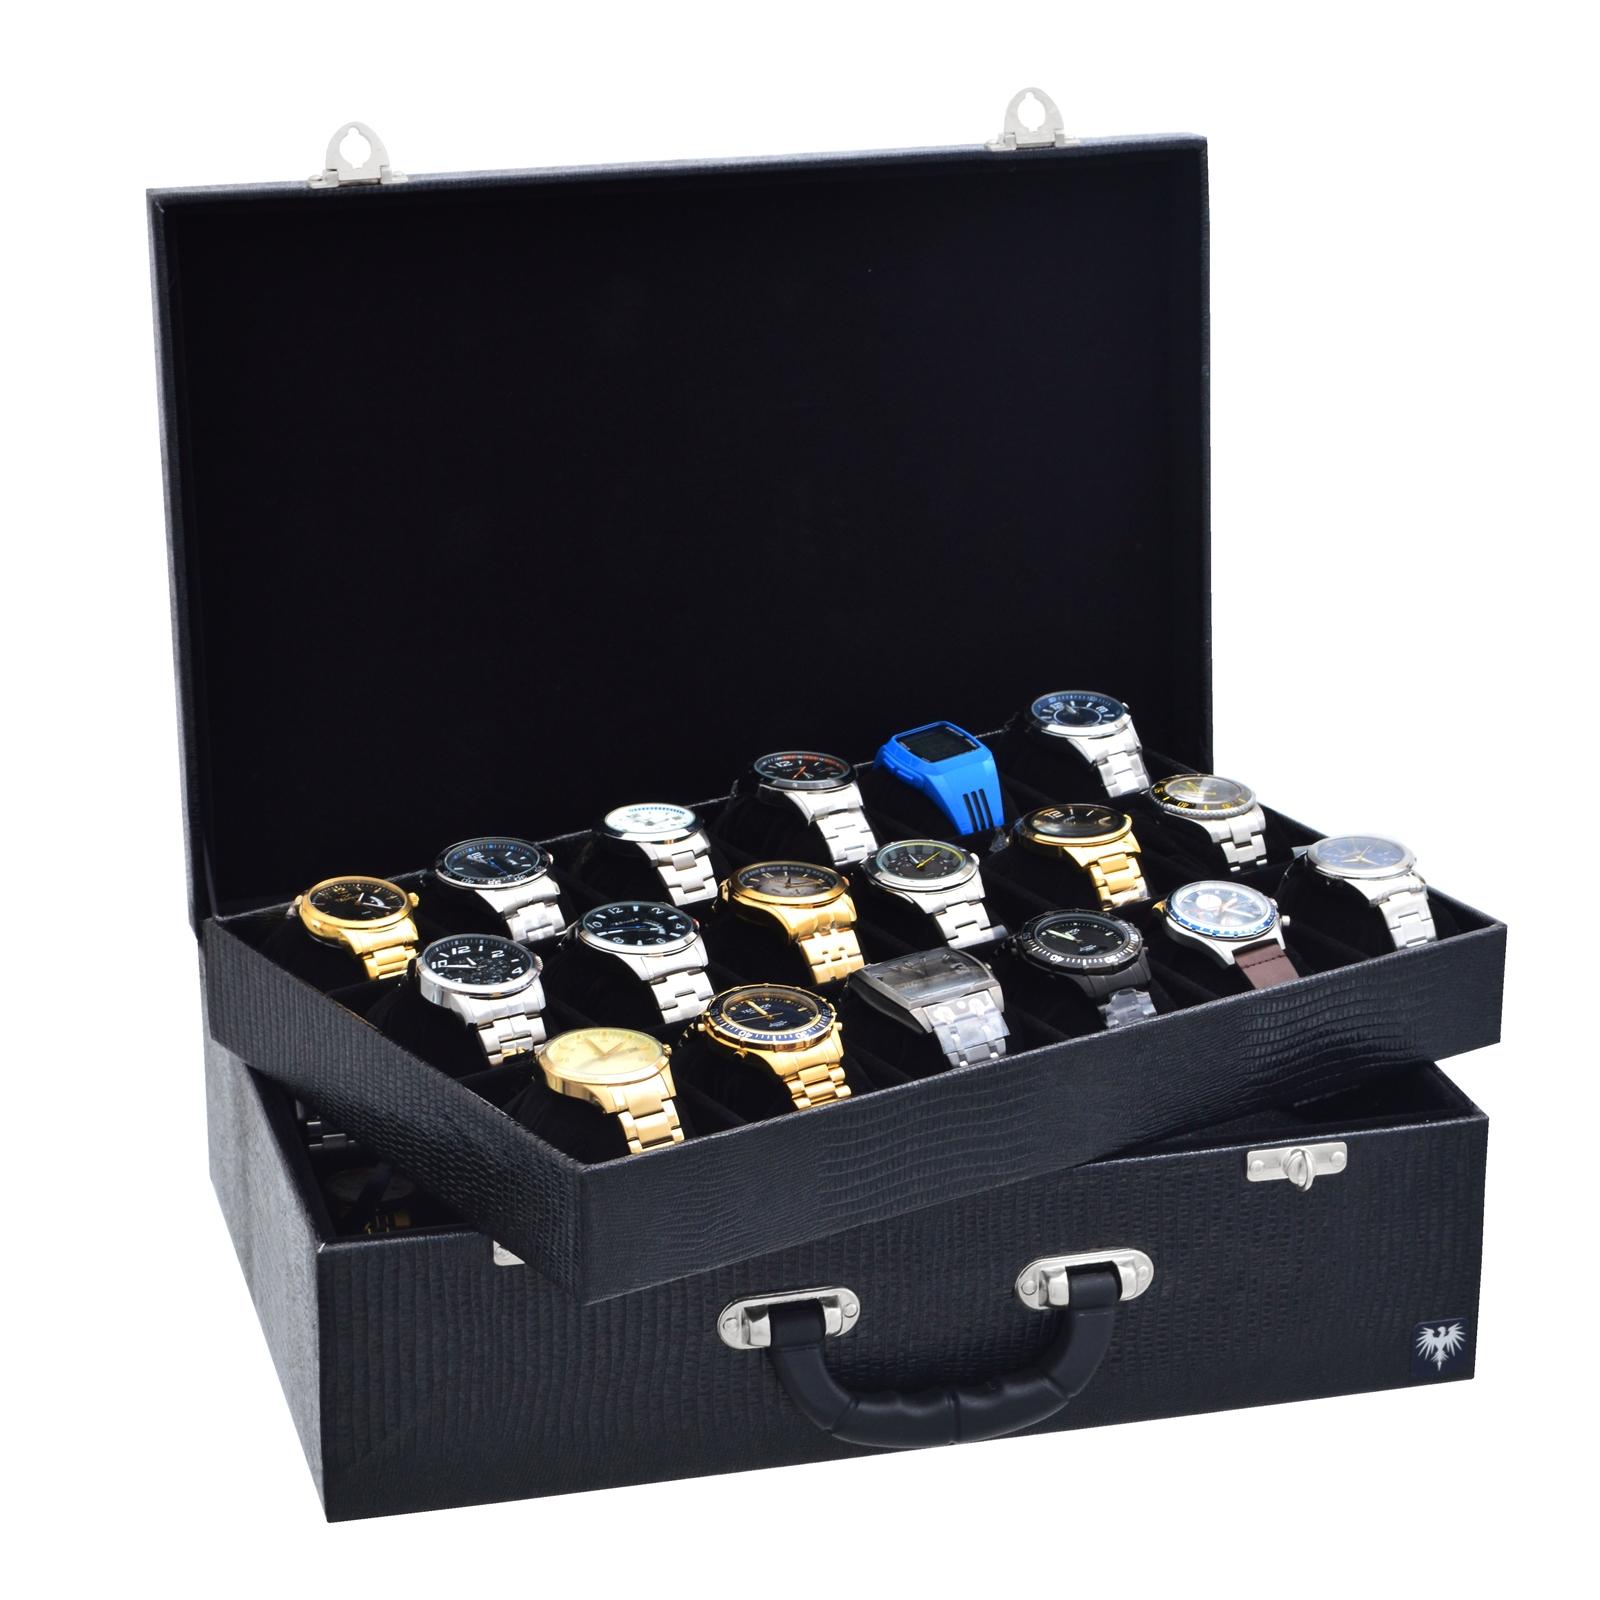 maleta-porta-relogio-36-nichos-couro-ecologico-preto-preto-imagem-1.JPG